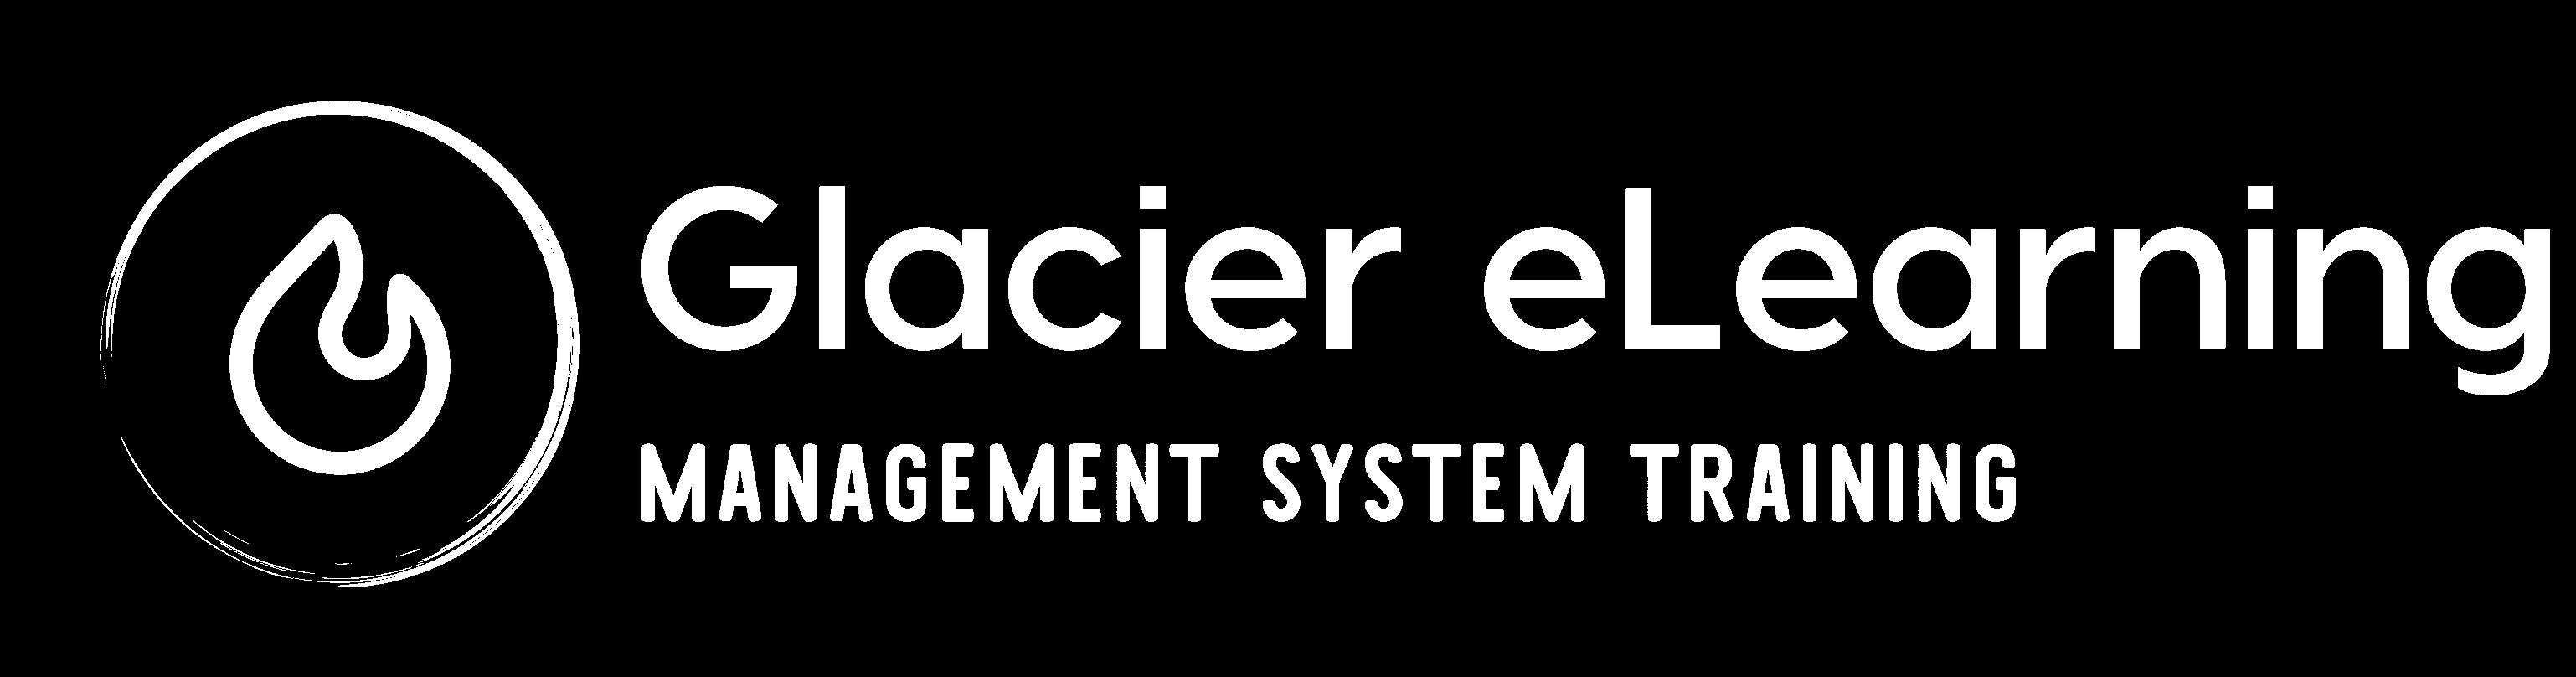 Glacier eLearning